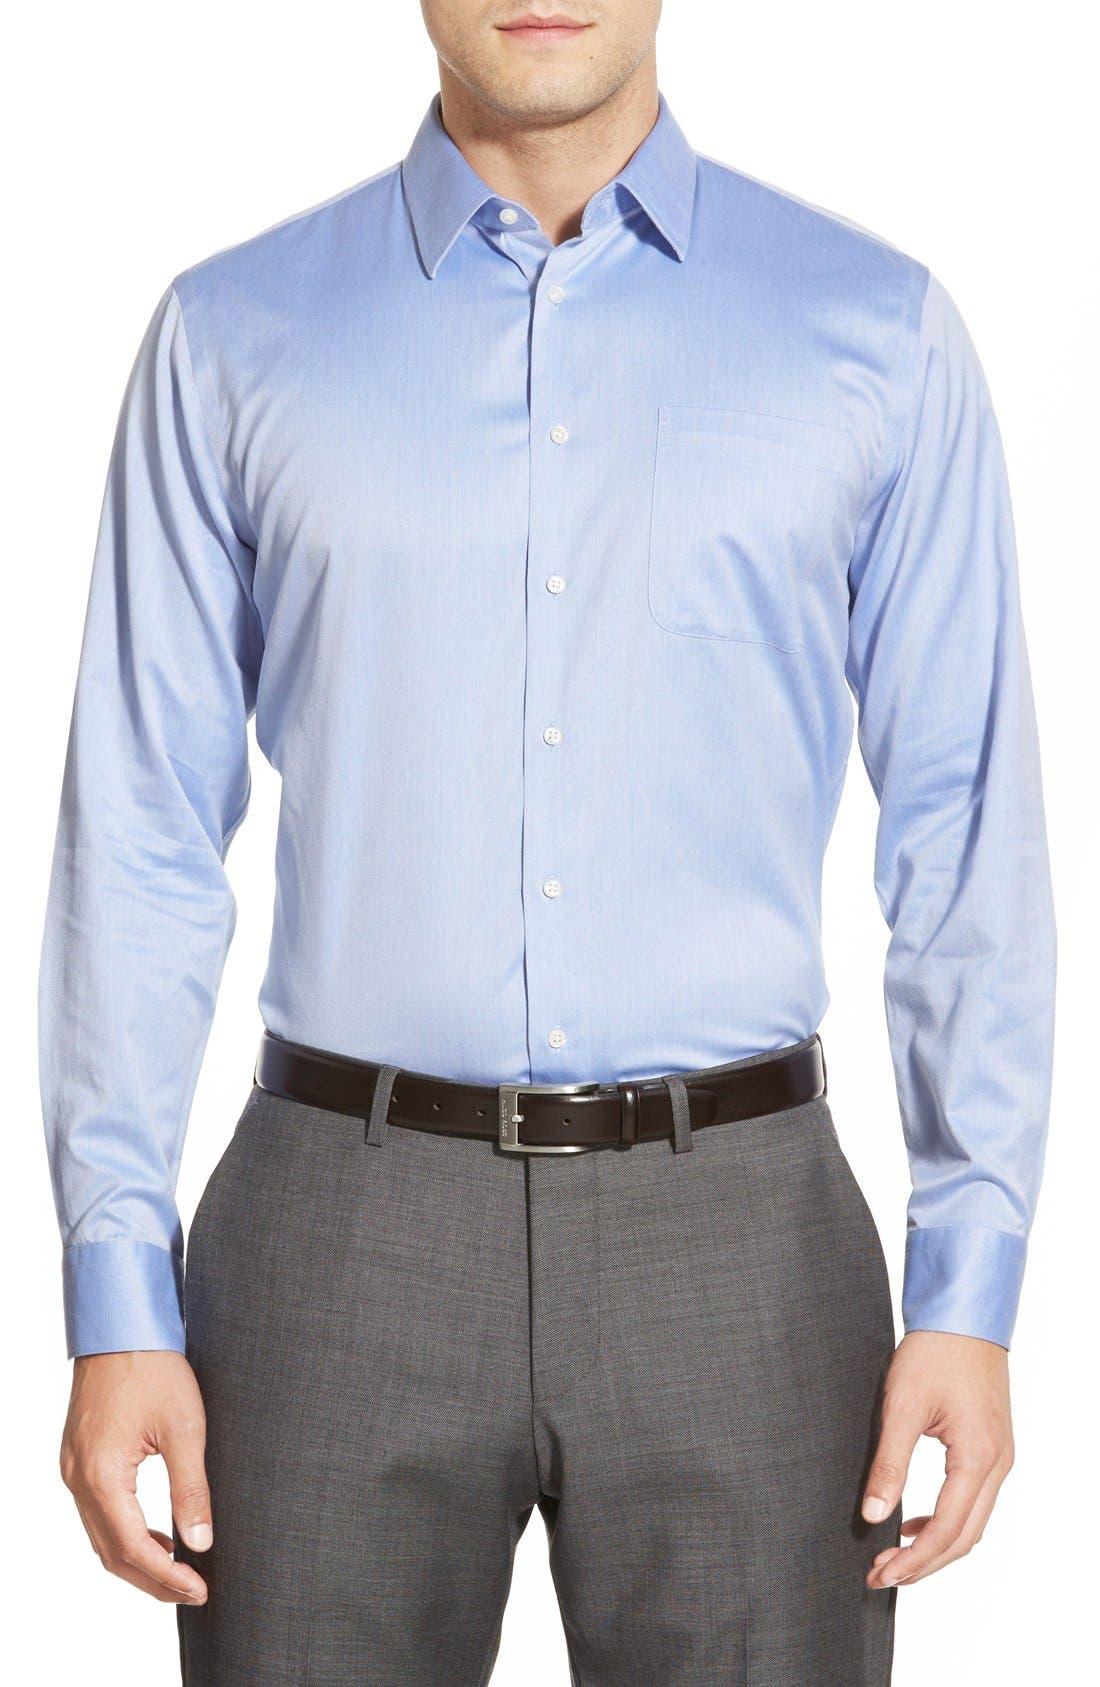 Alternate Image 2  - Nordstrom Men's Shop Smartcare™ Trim Fit Twill Dress Shirt